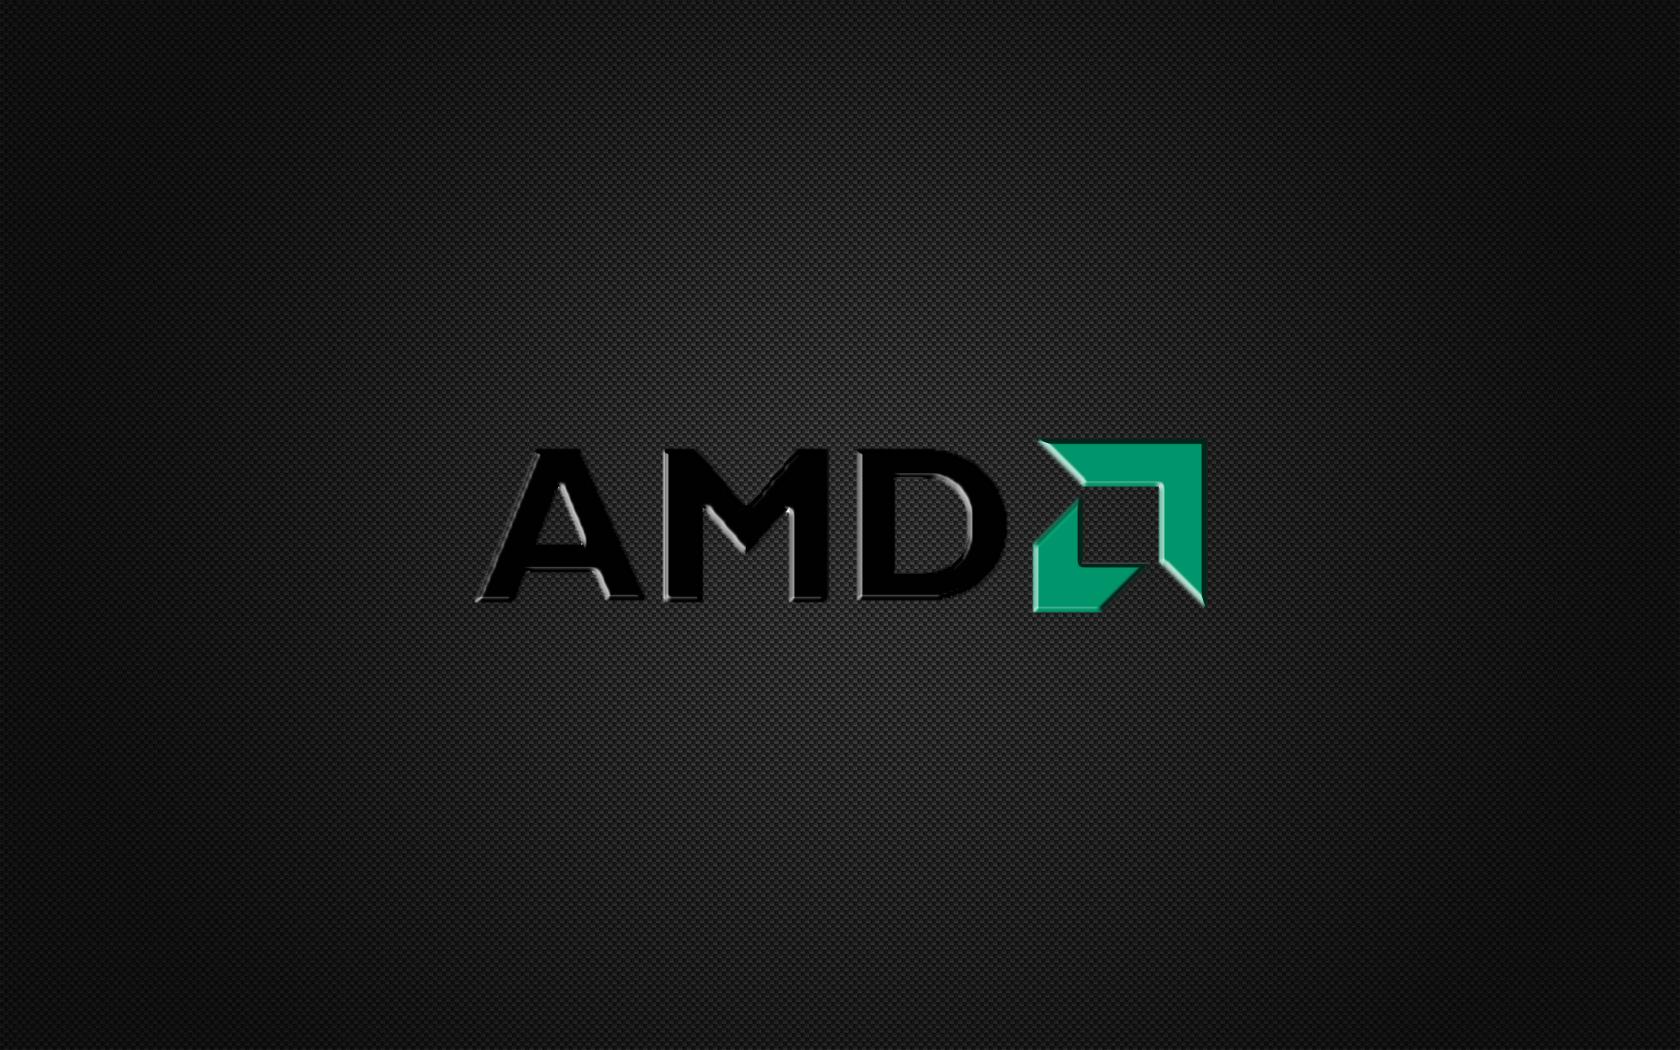 AMD Logo Wallpaper 3462 1680 x 1050 - WallpaperLayer com